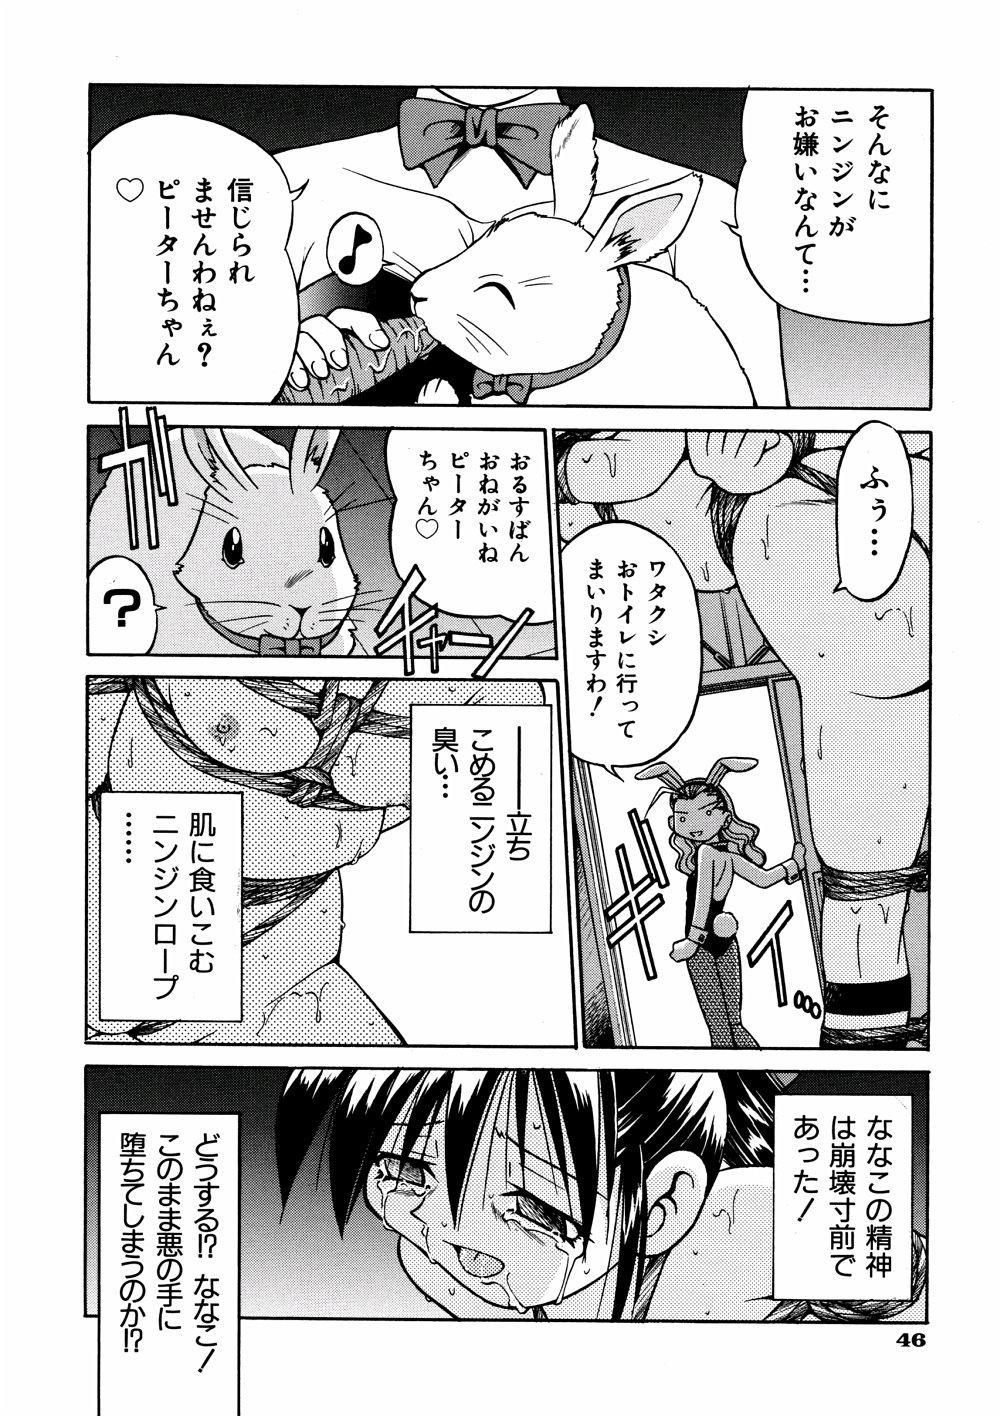 00 Nanako - Agent Nanako 48